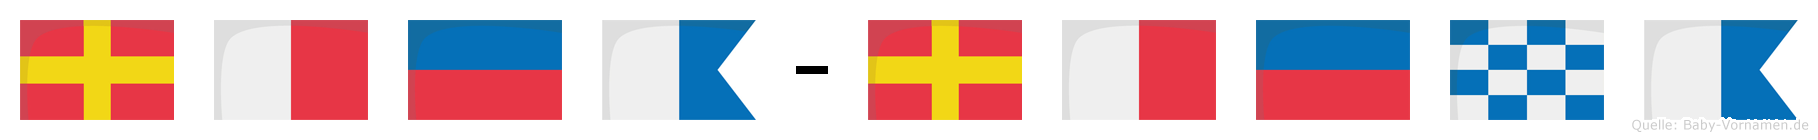 Rhea-Rhena im Flaggenalphabet